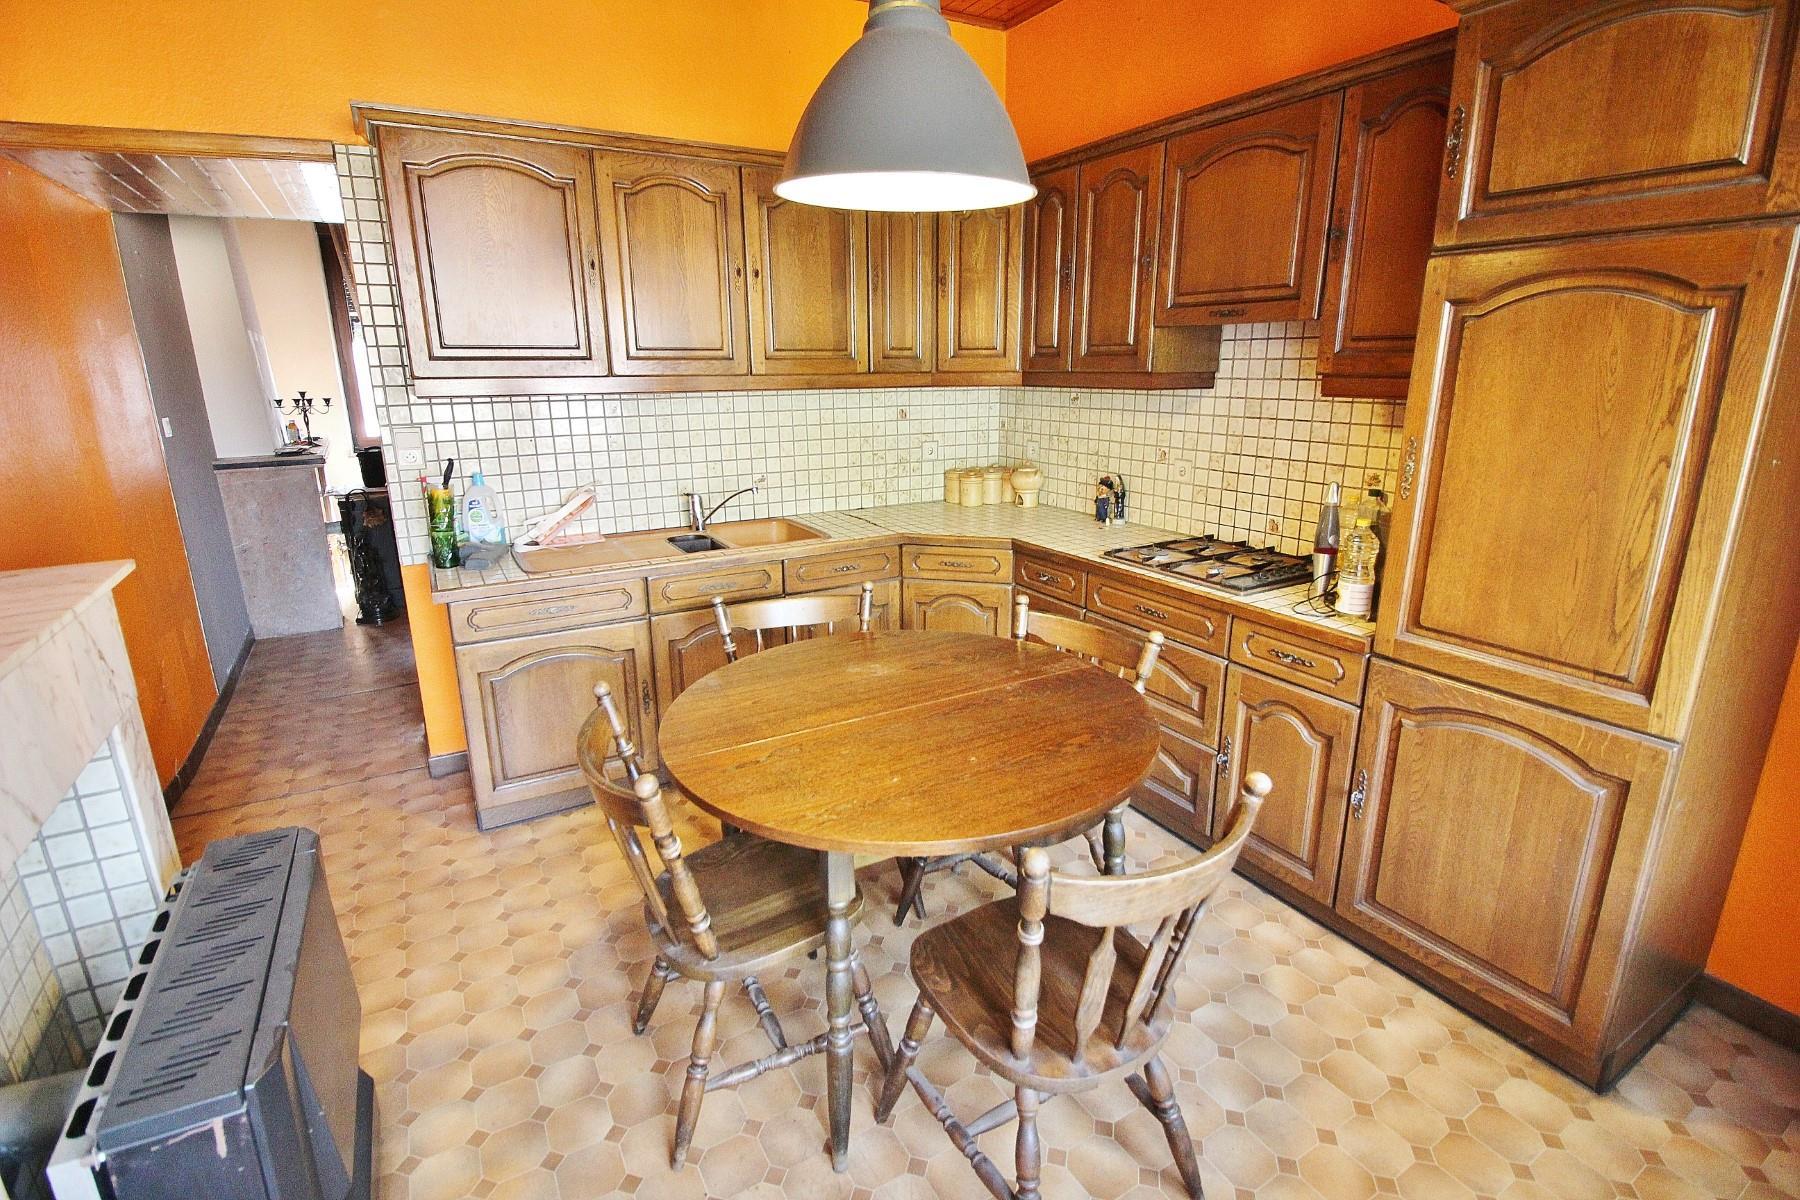 Maison - Seraing Jemeppesur-Meuse - #3539725-3